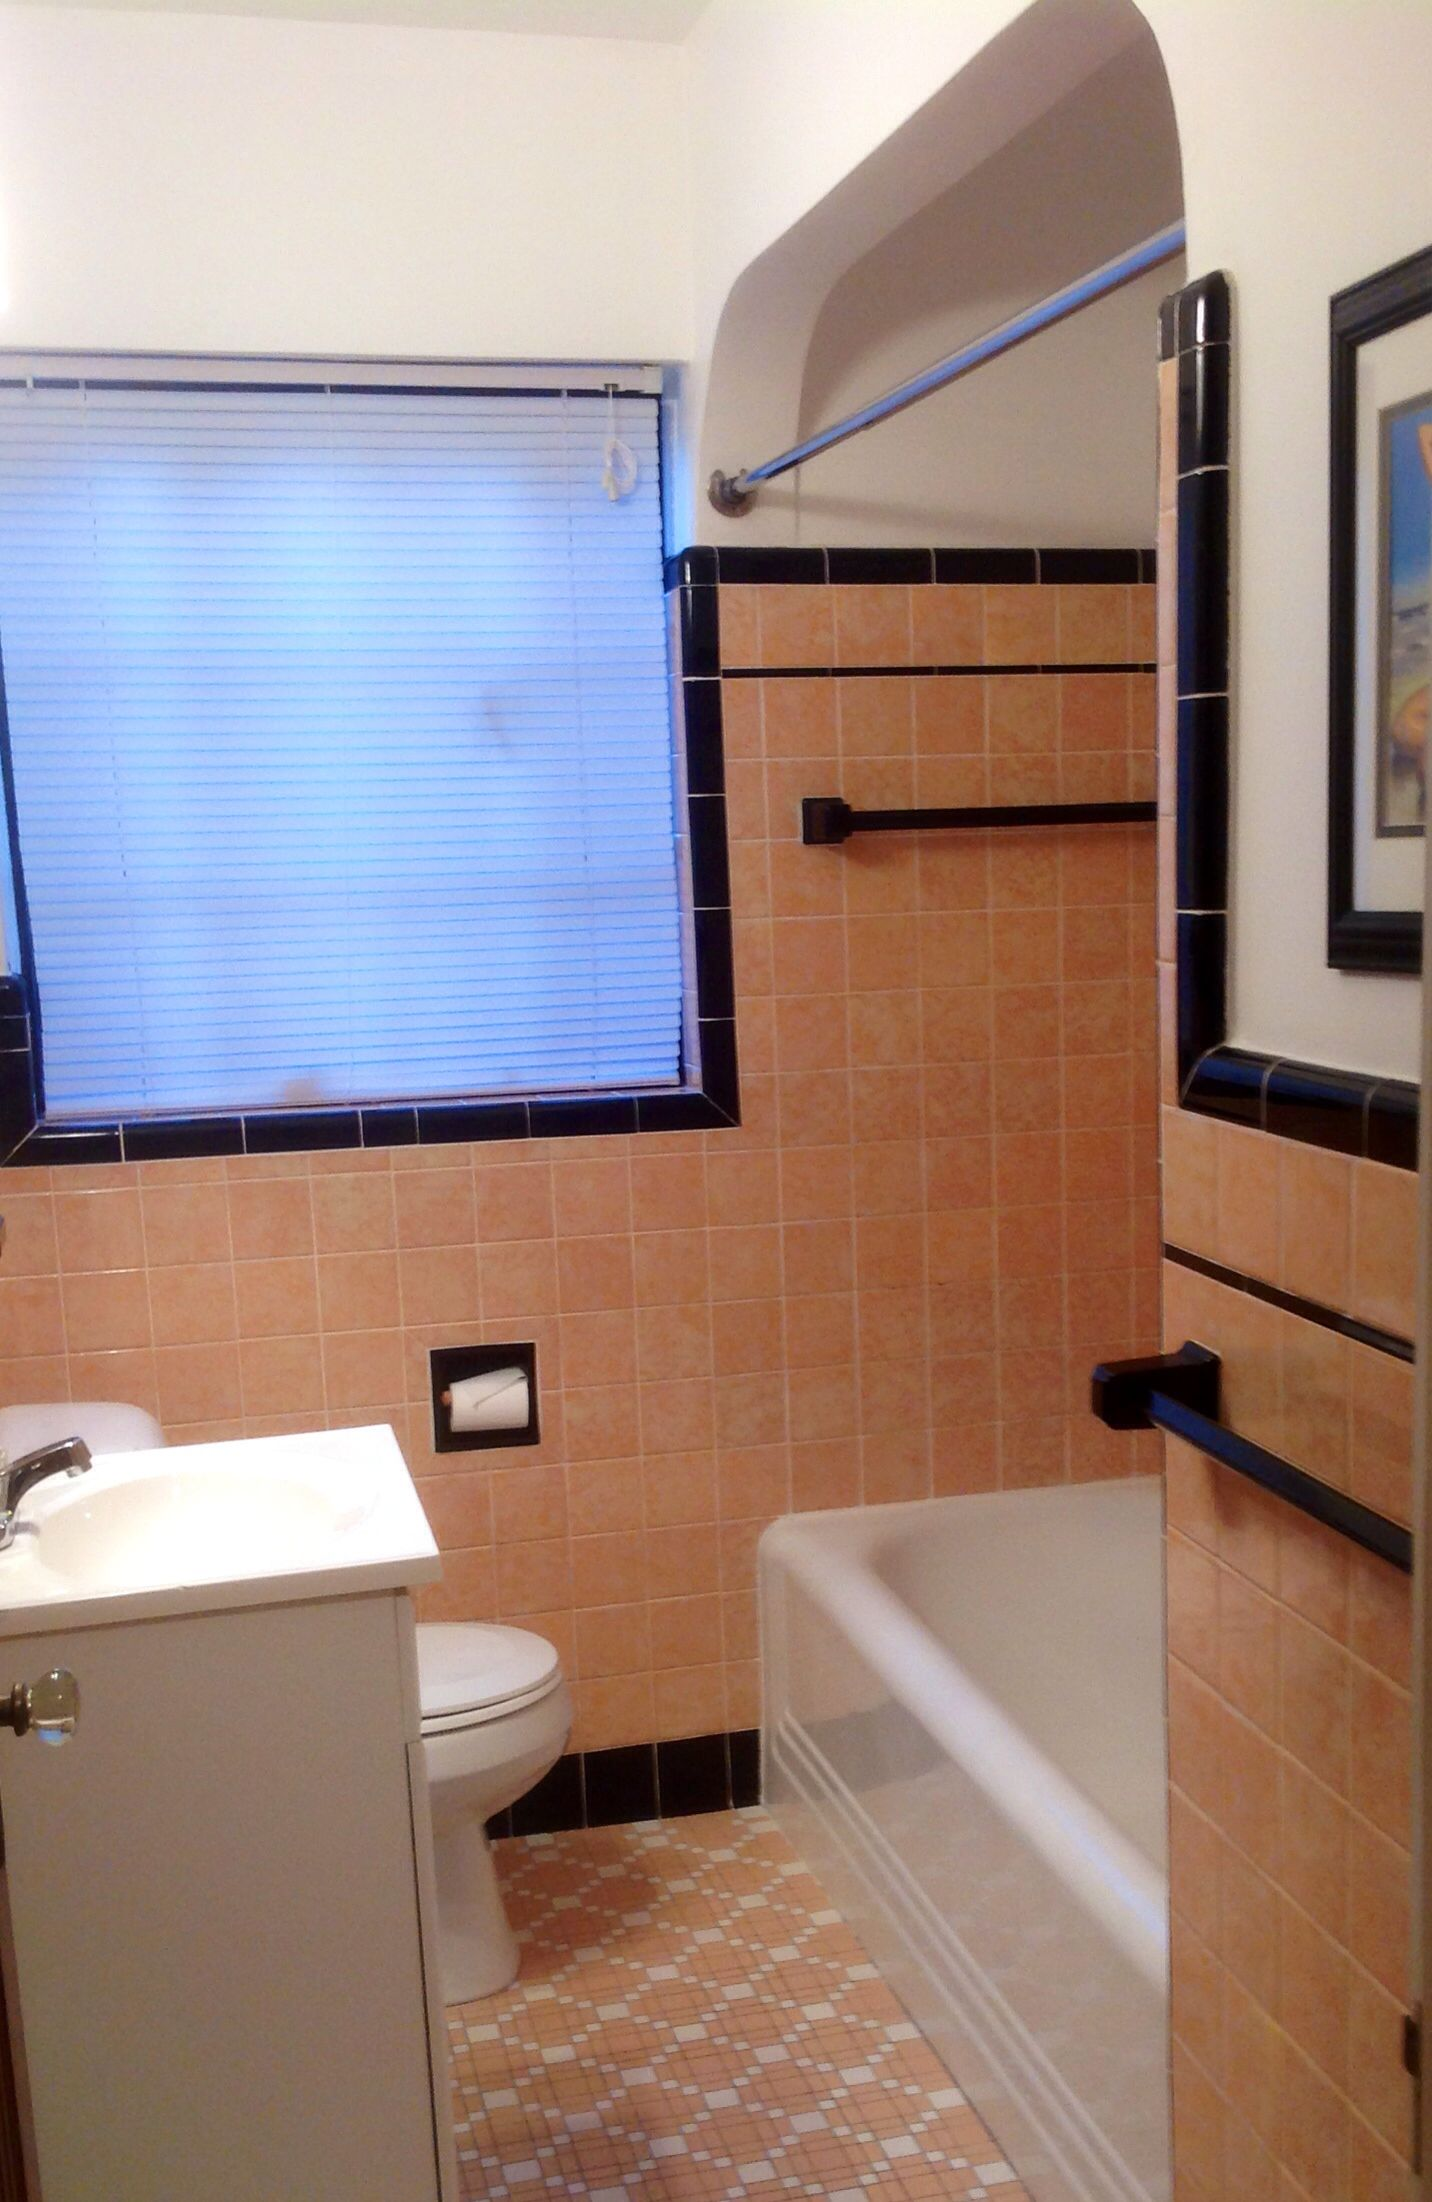 Vintage 1937 Peach And Black Bathroom Original To My Home